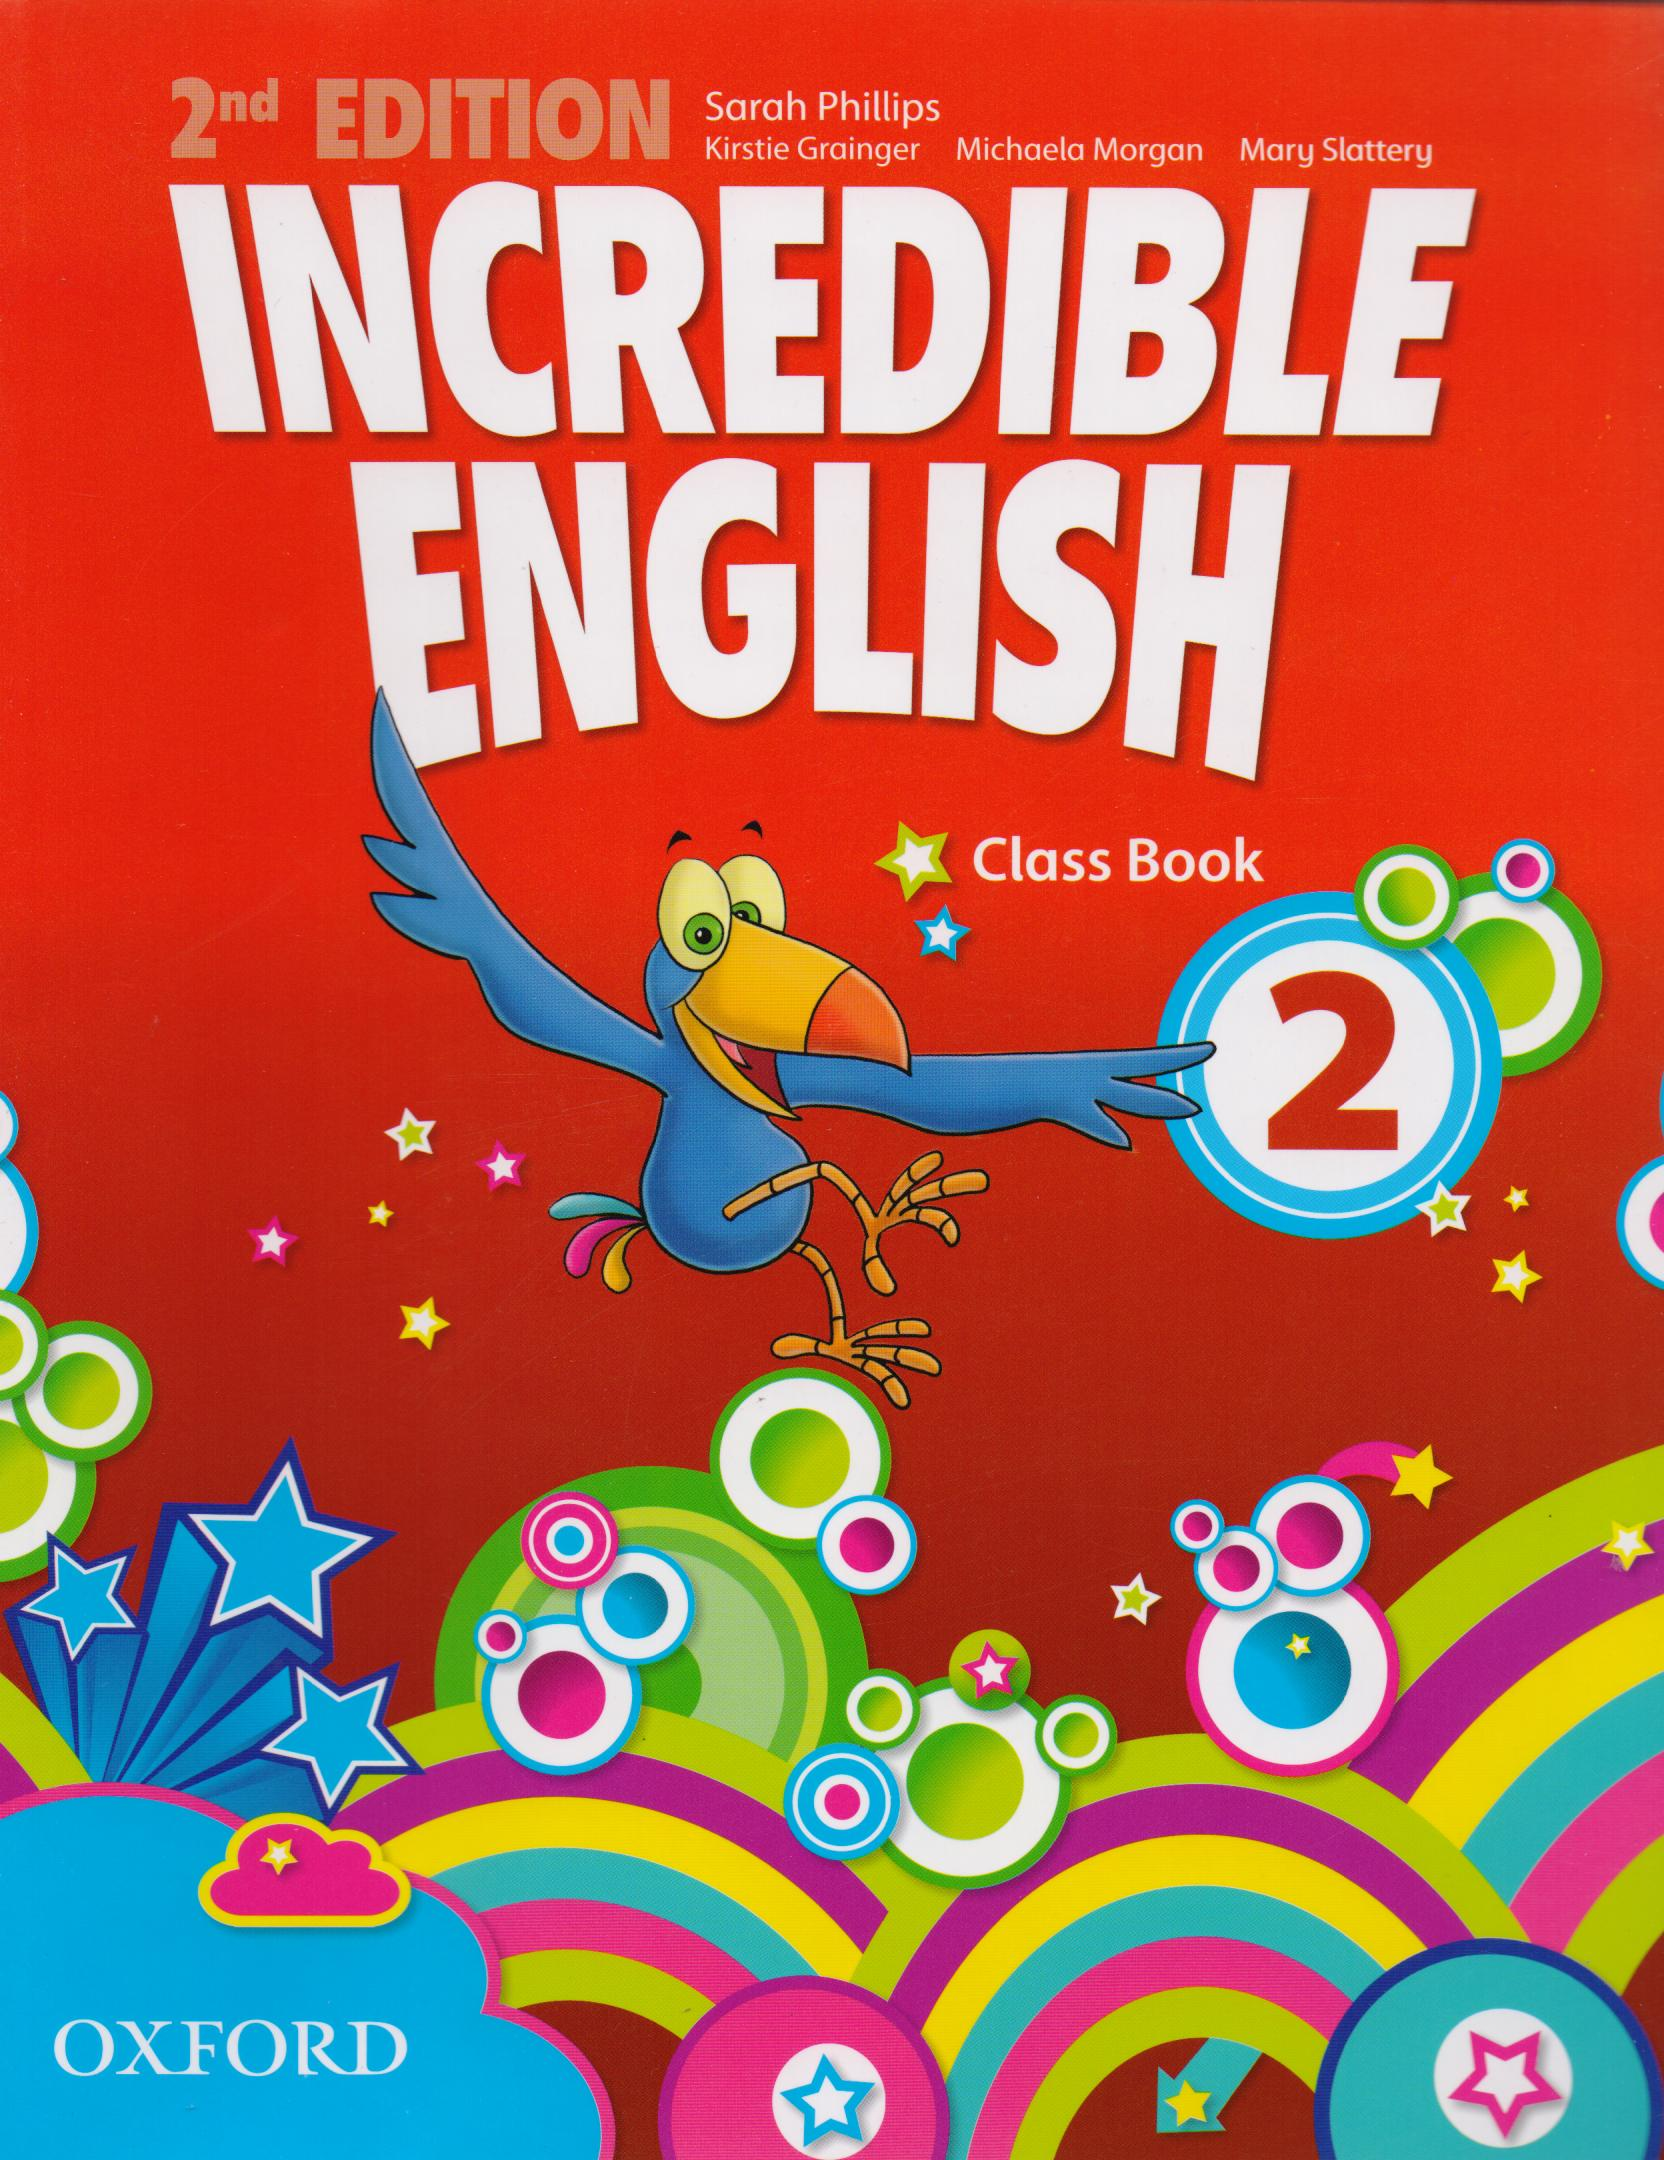 ksztalcenie_zintegrowane__jezyk_angielski__klasa_13__incredible_english_2__podrecznik__oxford_IMAGE1_320673_4